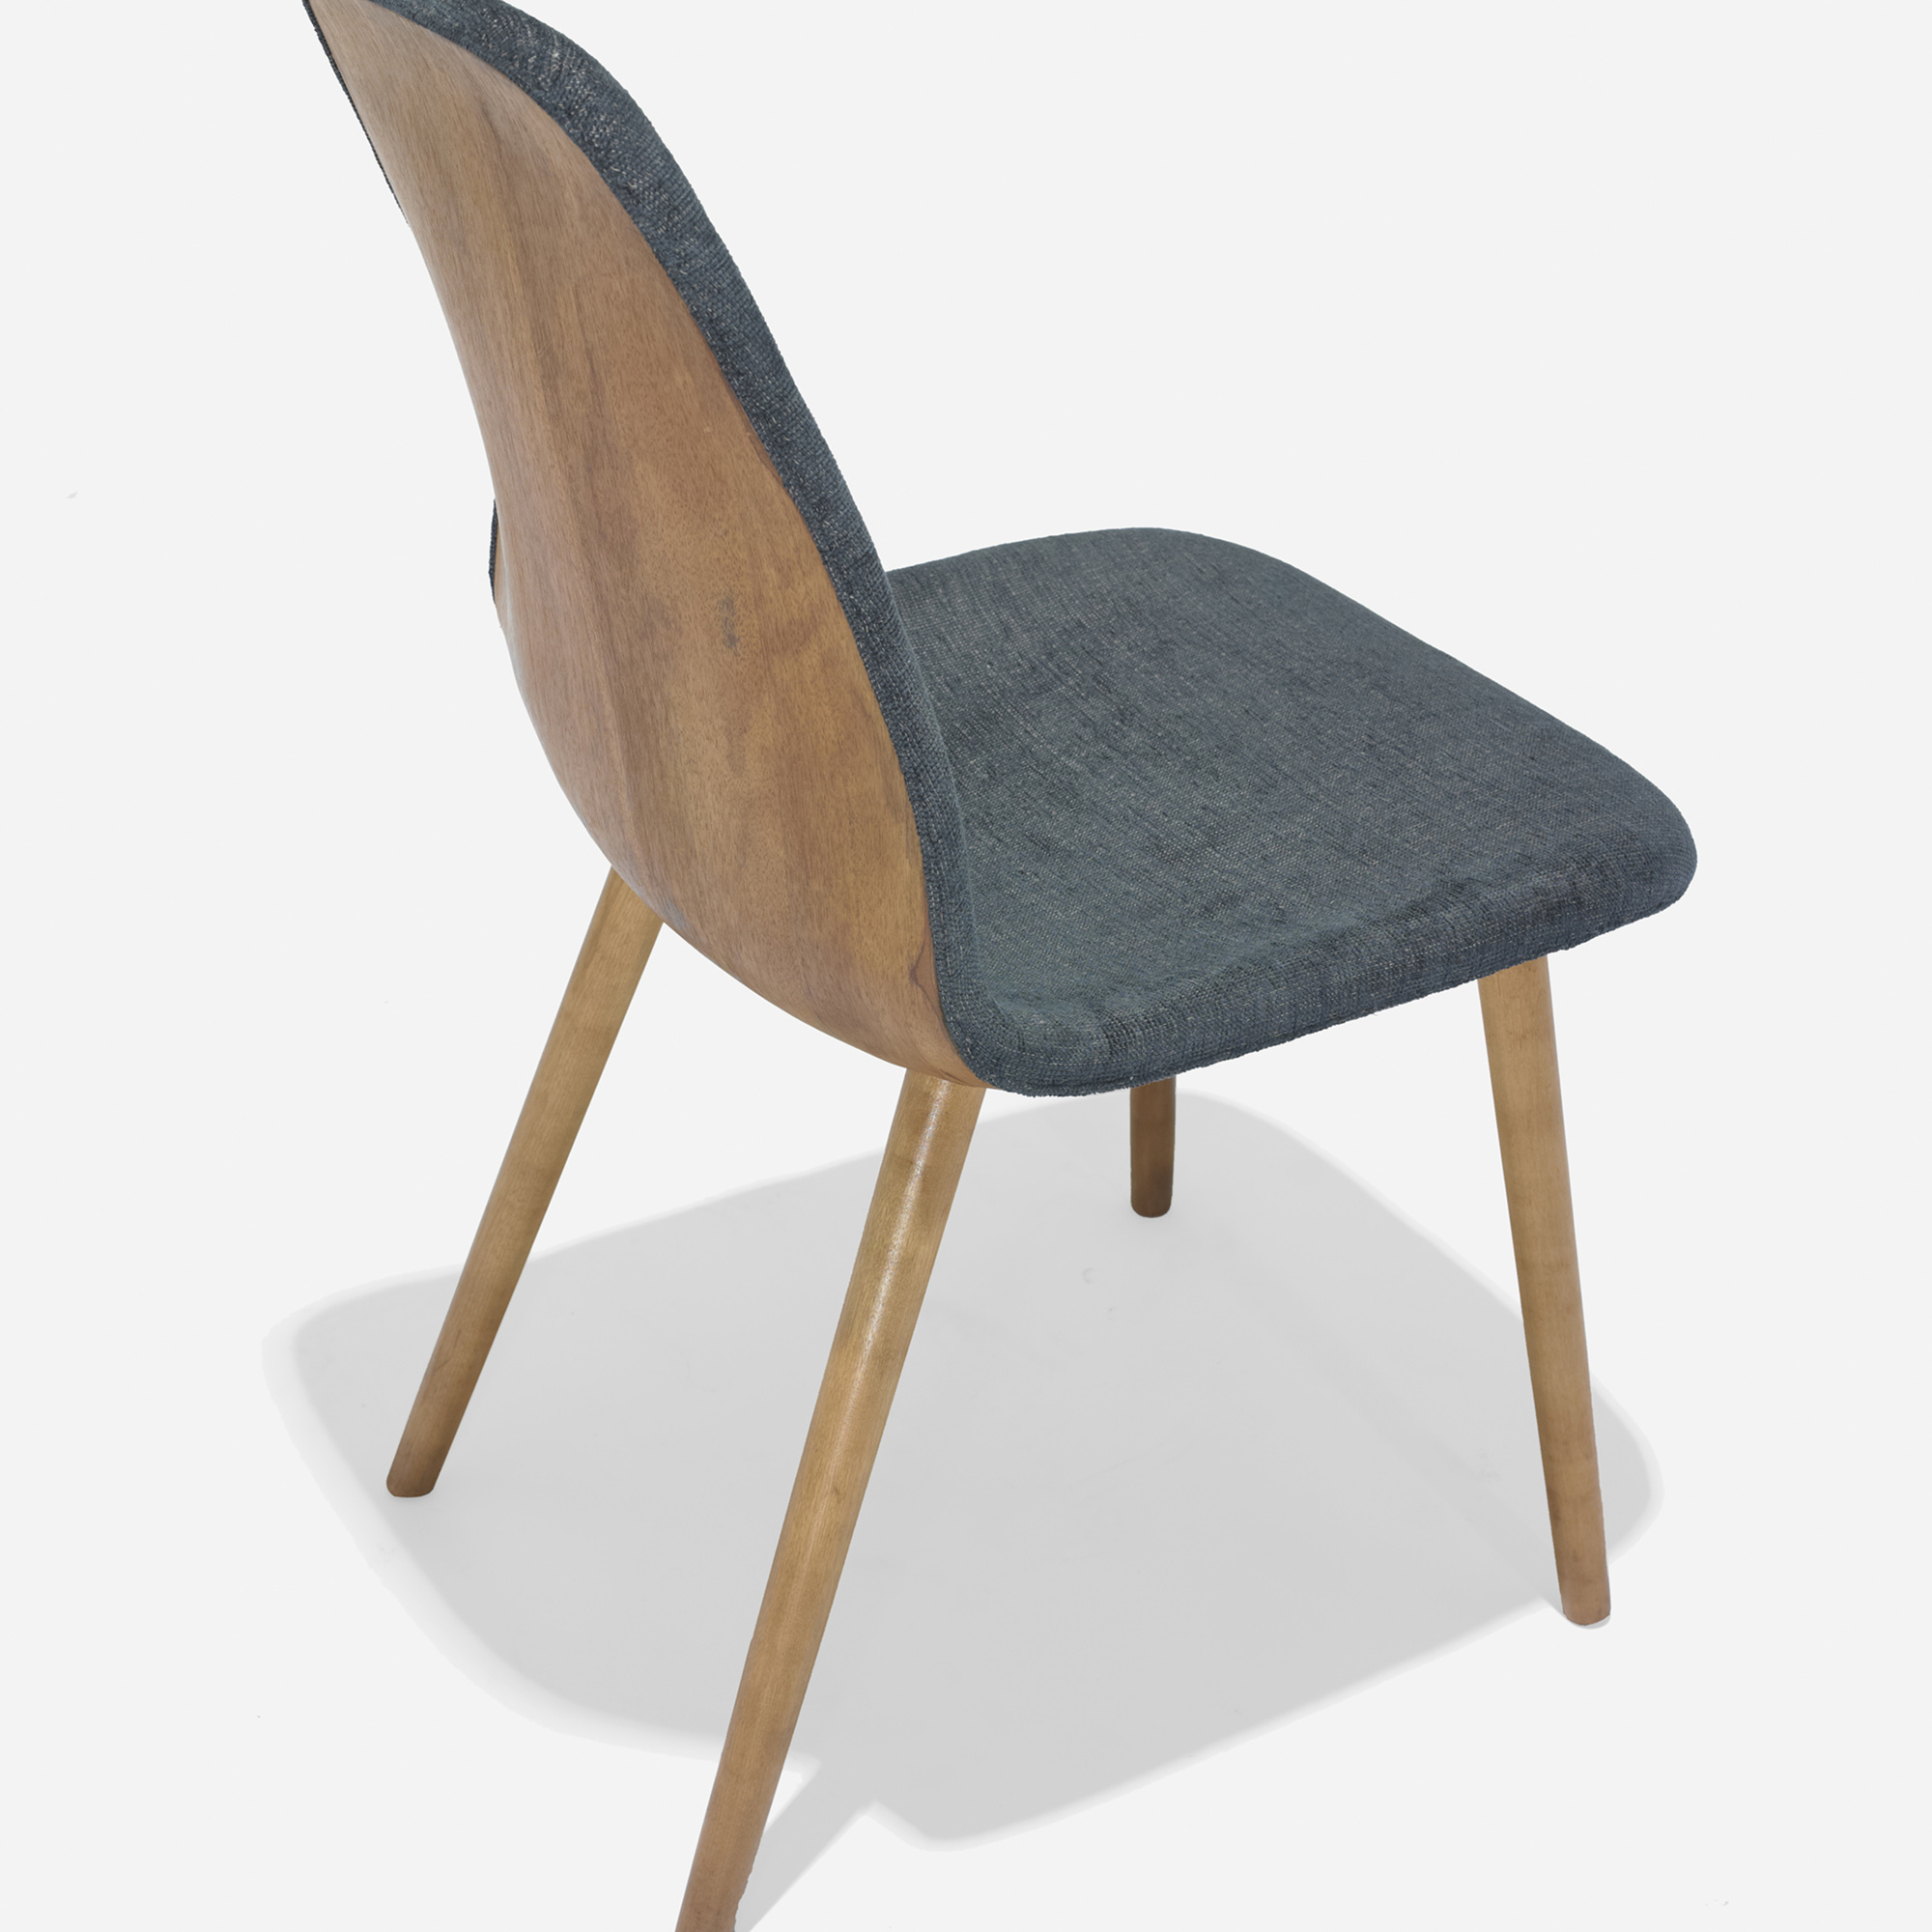 Womb chair amazon mid century vintage knoll eero saarinen green executive arm bedroom womb - Vintage womb chair for sale ...